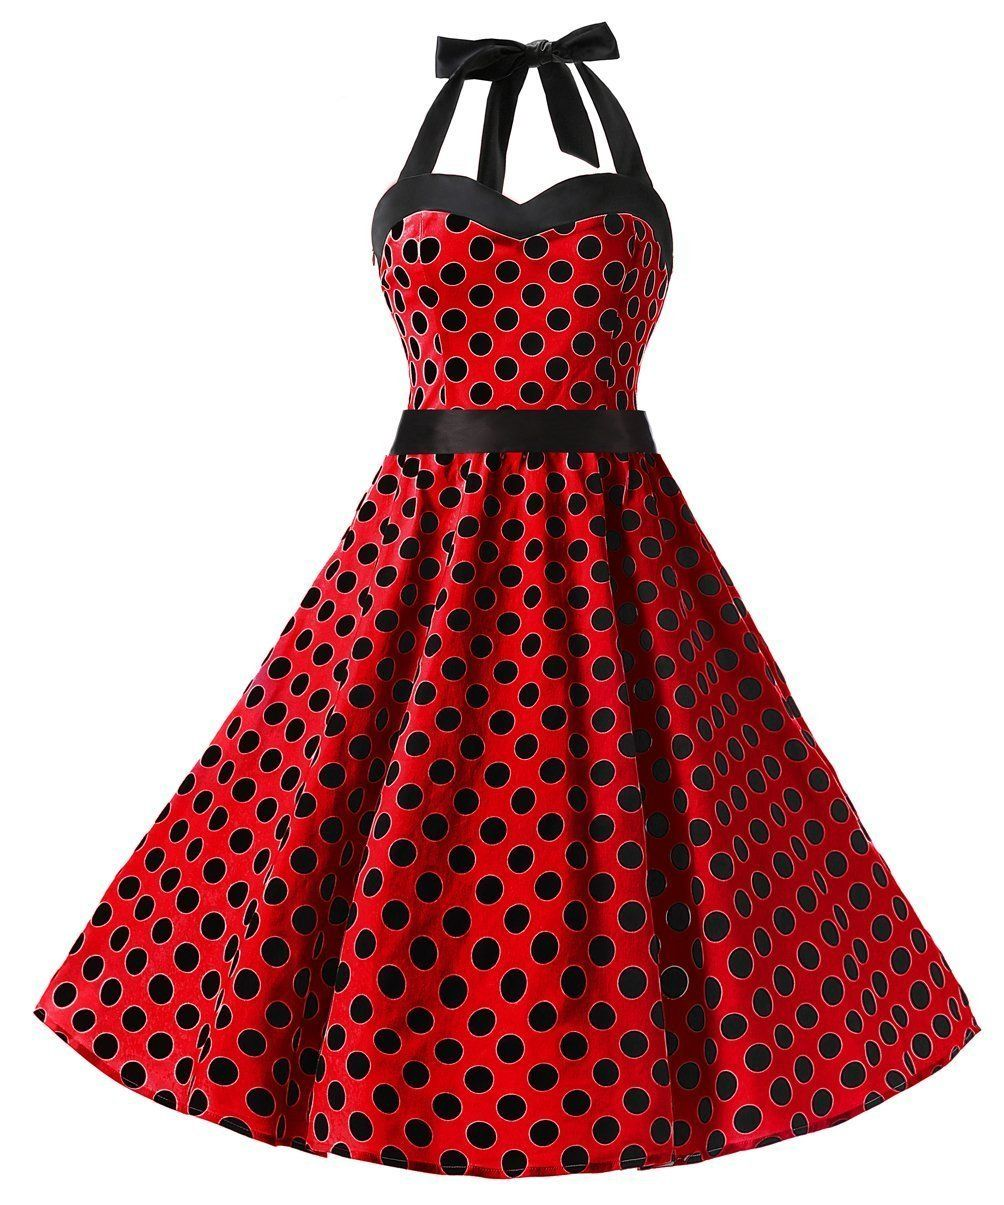 Dresstells® Halter 50s Rockabilly Polka Dots Audrey Dress Retro ...